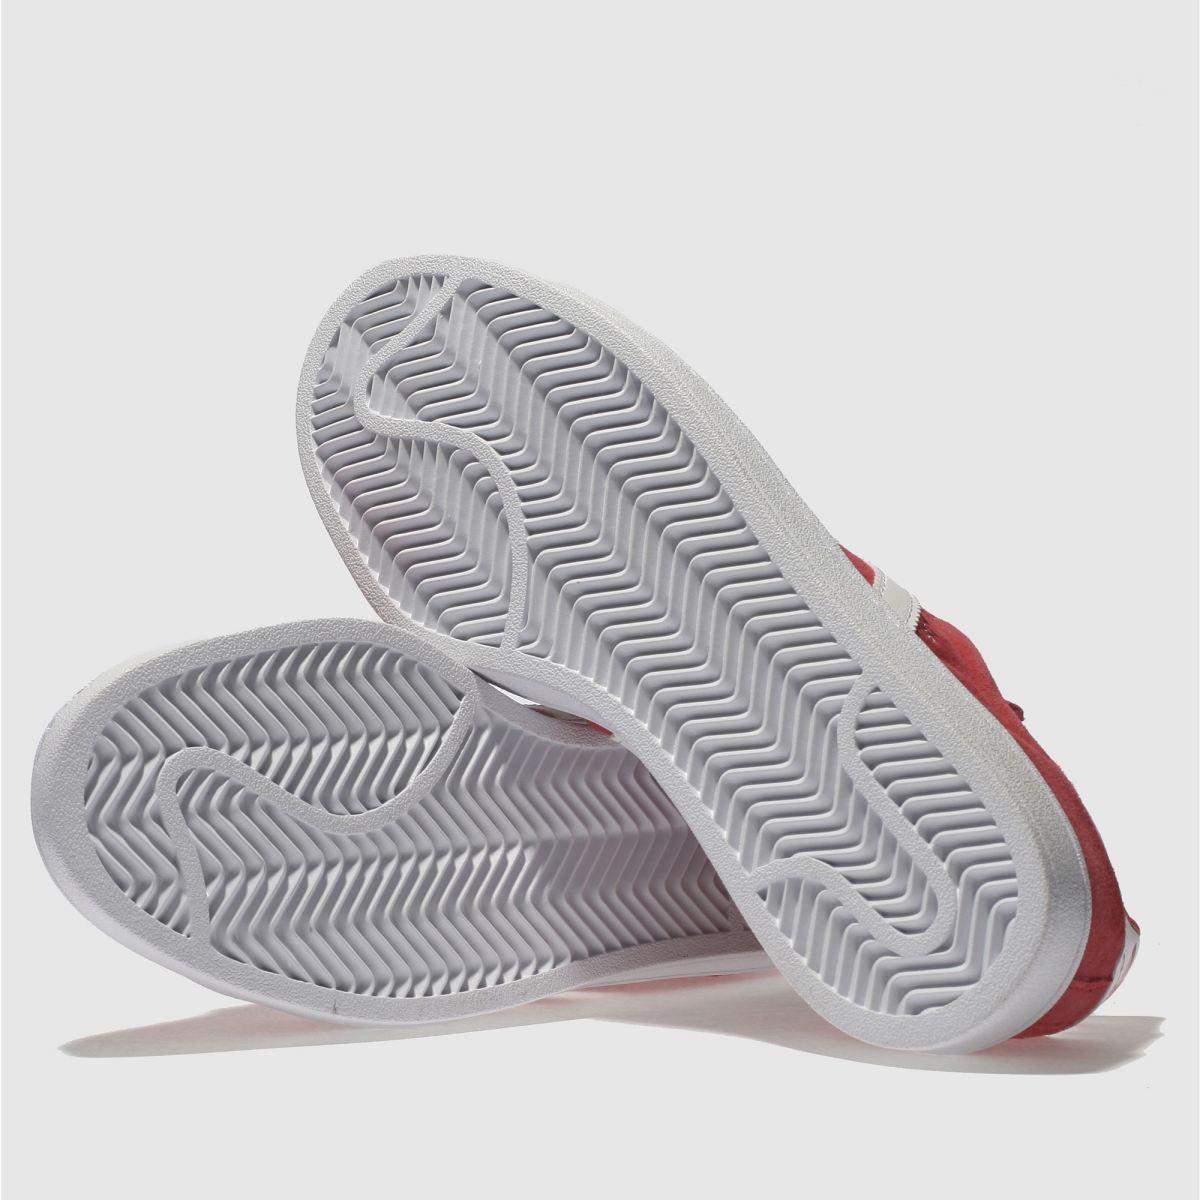 Damen Rot adidas Campus Suede Sneaker | Schuhe schuh Gute Qualität beliebte Schuhe | f21e5b